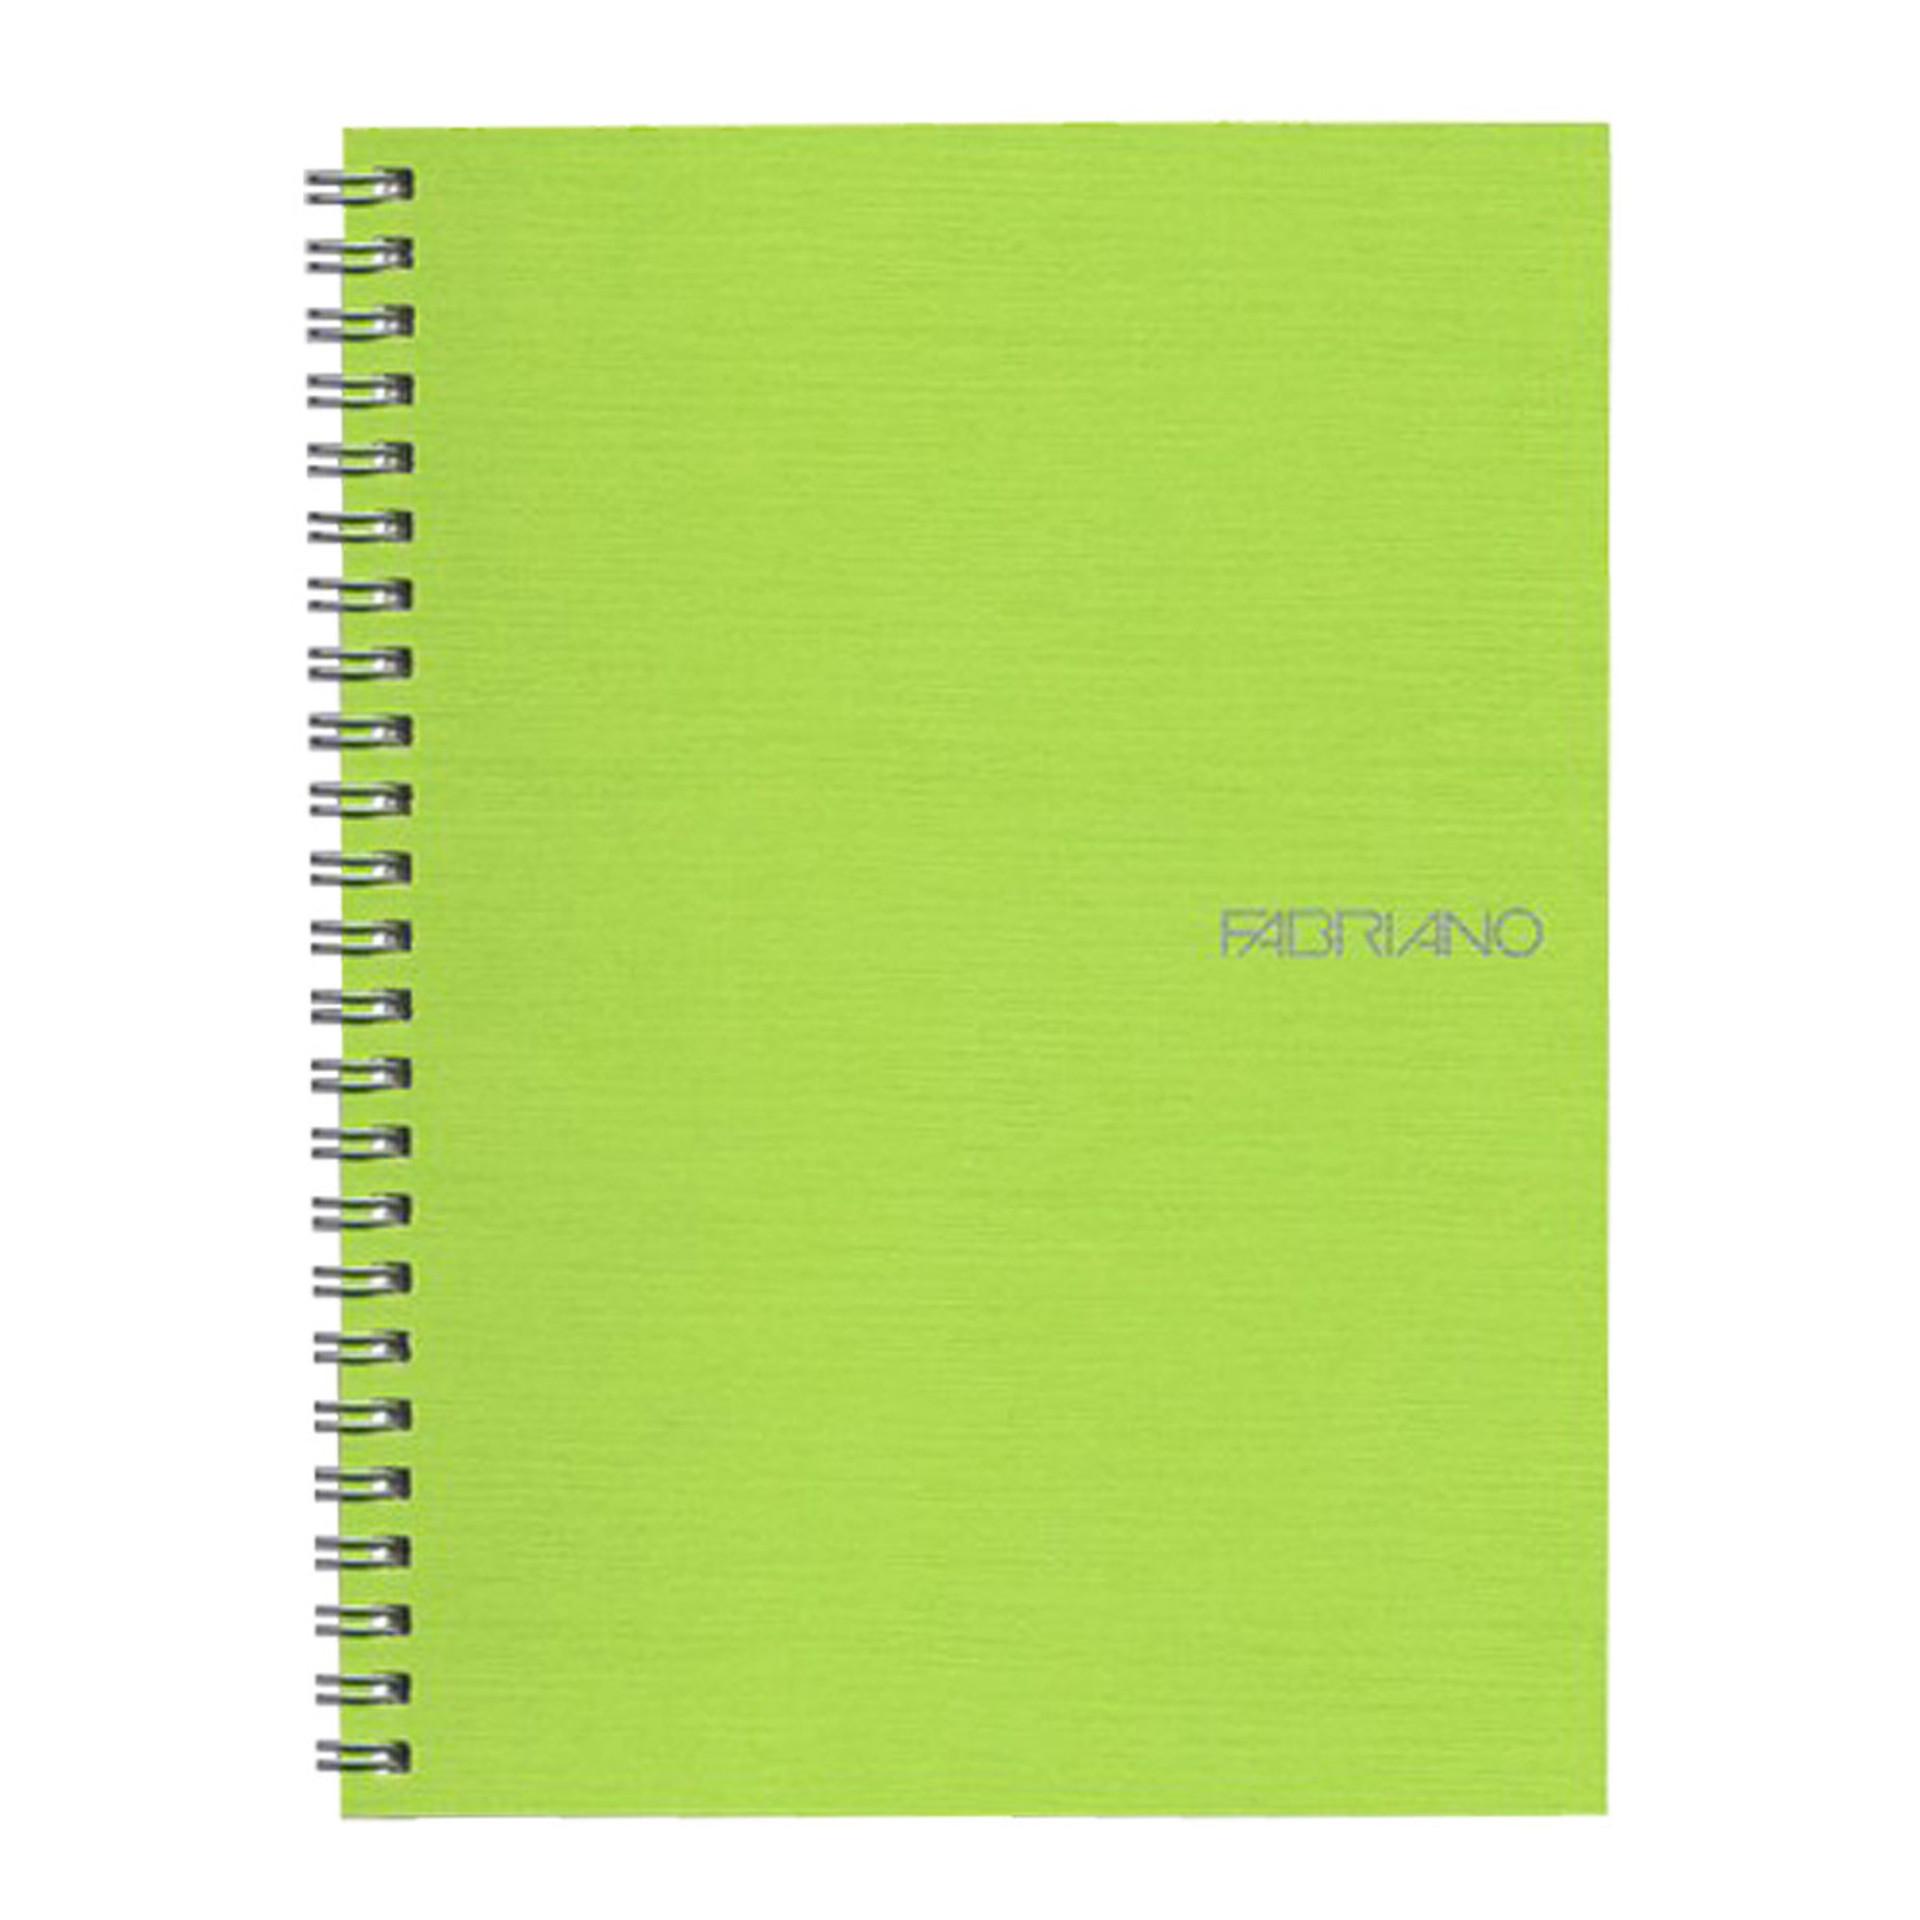 "Fabriano EcoQua Wire Bound Blank 6""x8"" Notebook Lime"